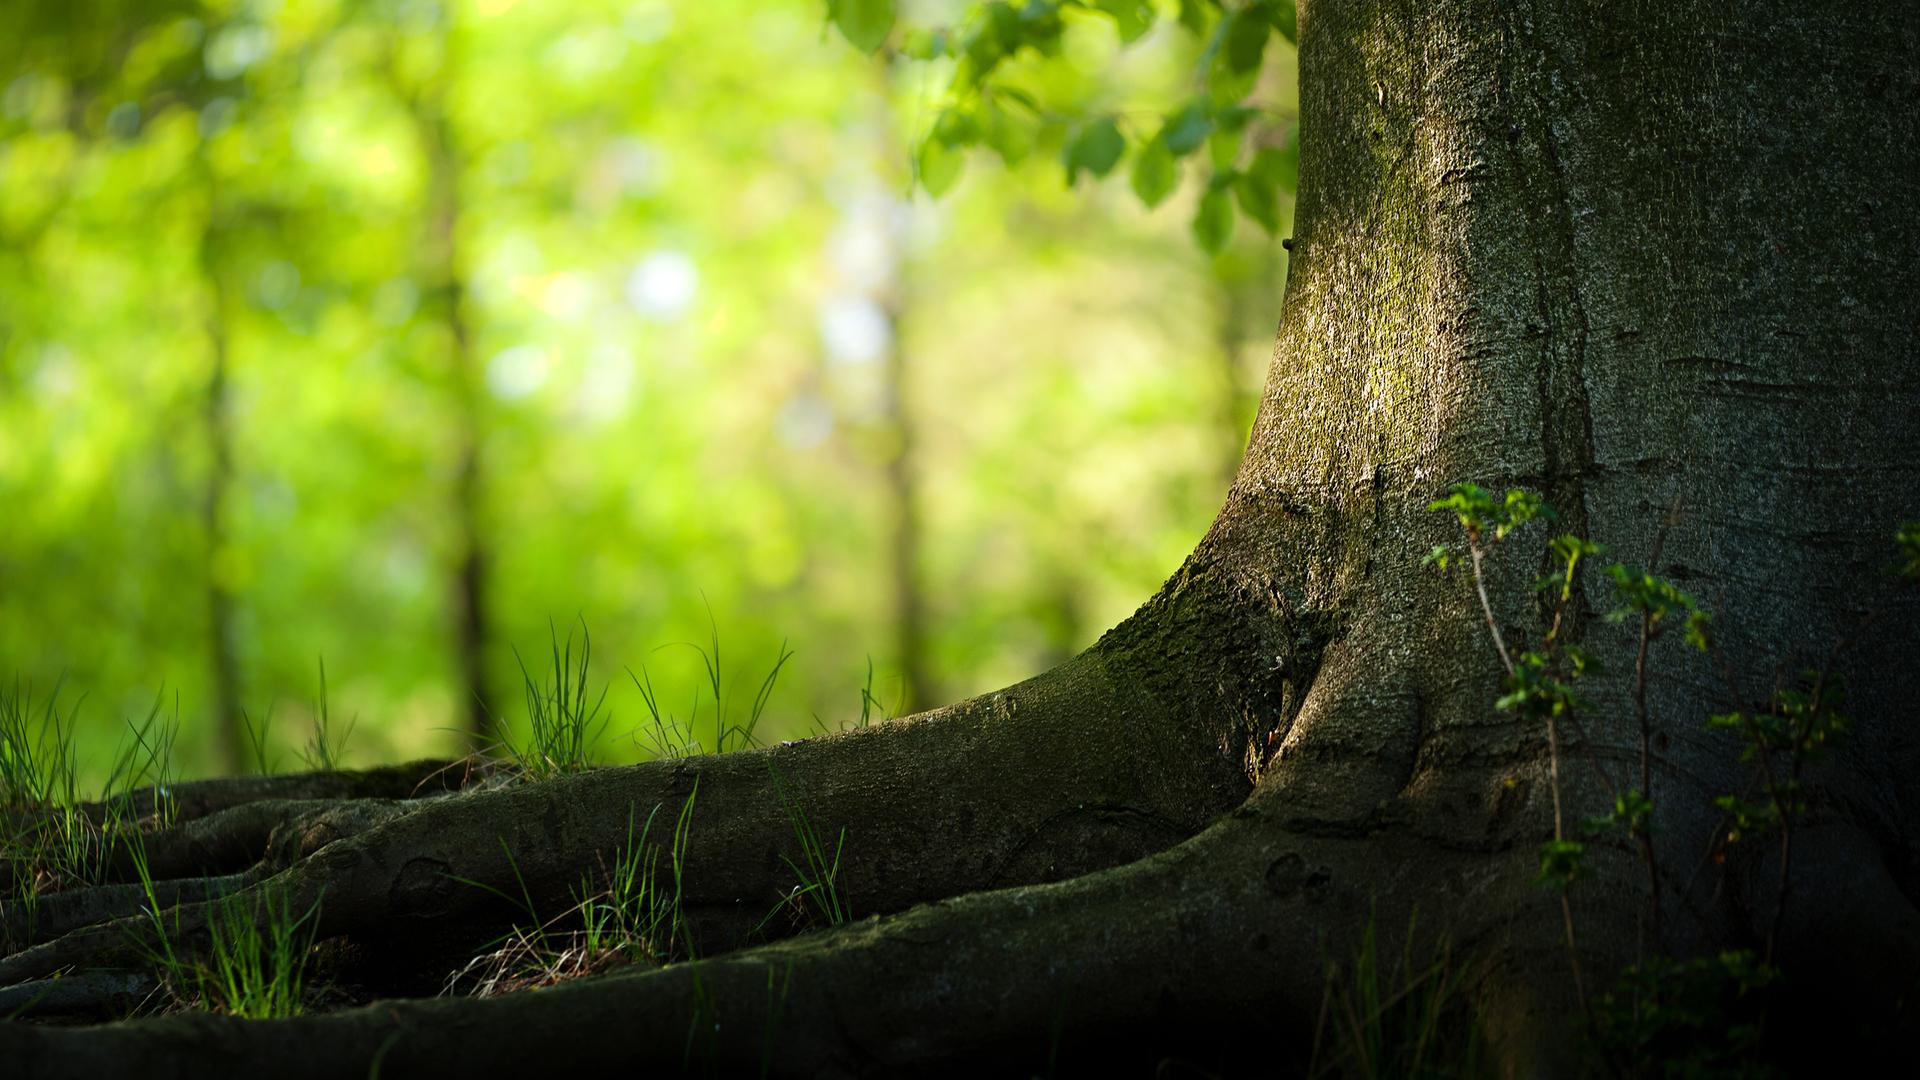 Nature Tree hd Desktop Backgrounds 1920x1080